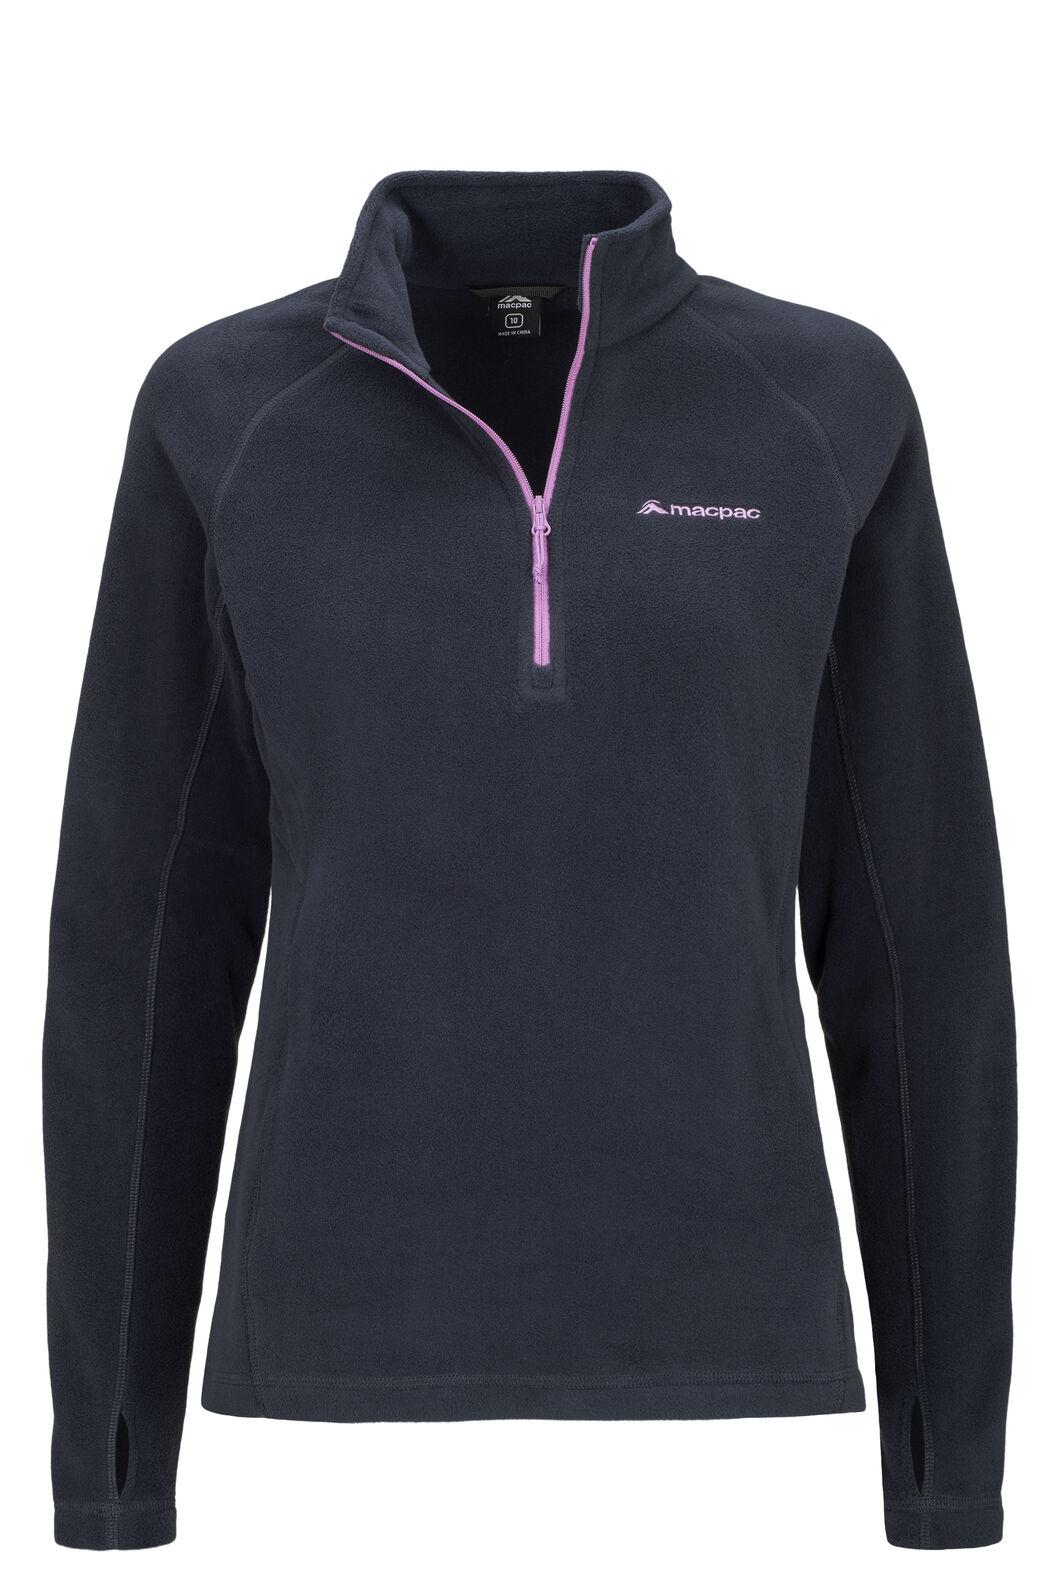 Macpac Tui Polartec® Micro Fleece® Pullover — Women's, Total Eclipse, hi-res